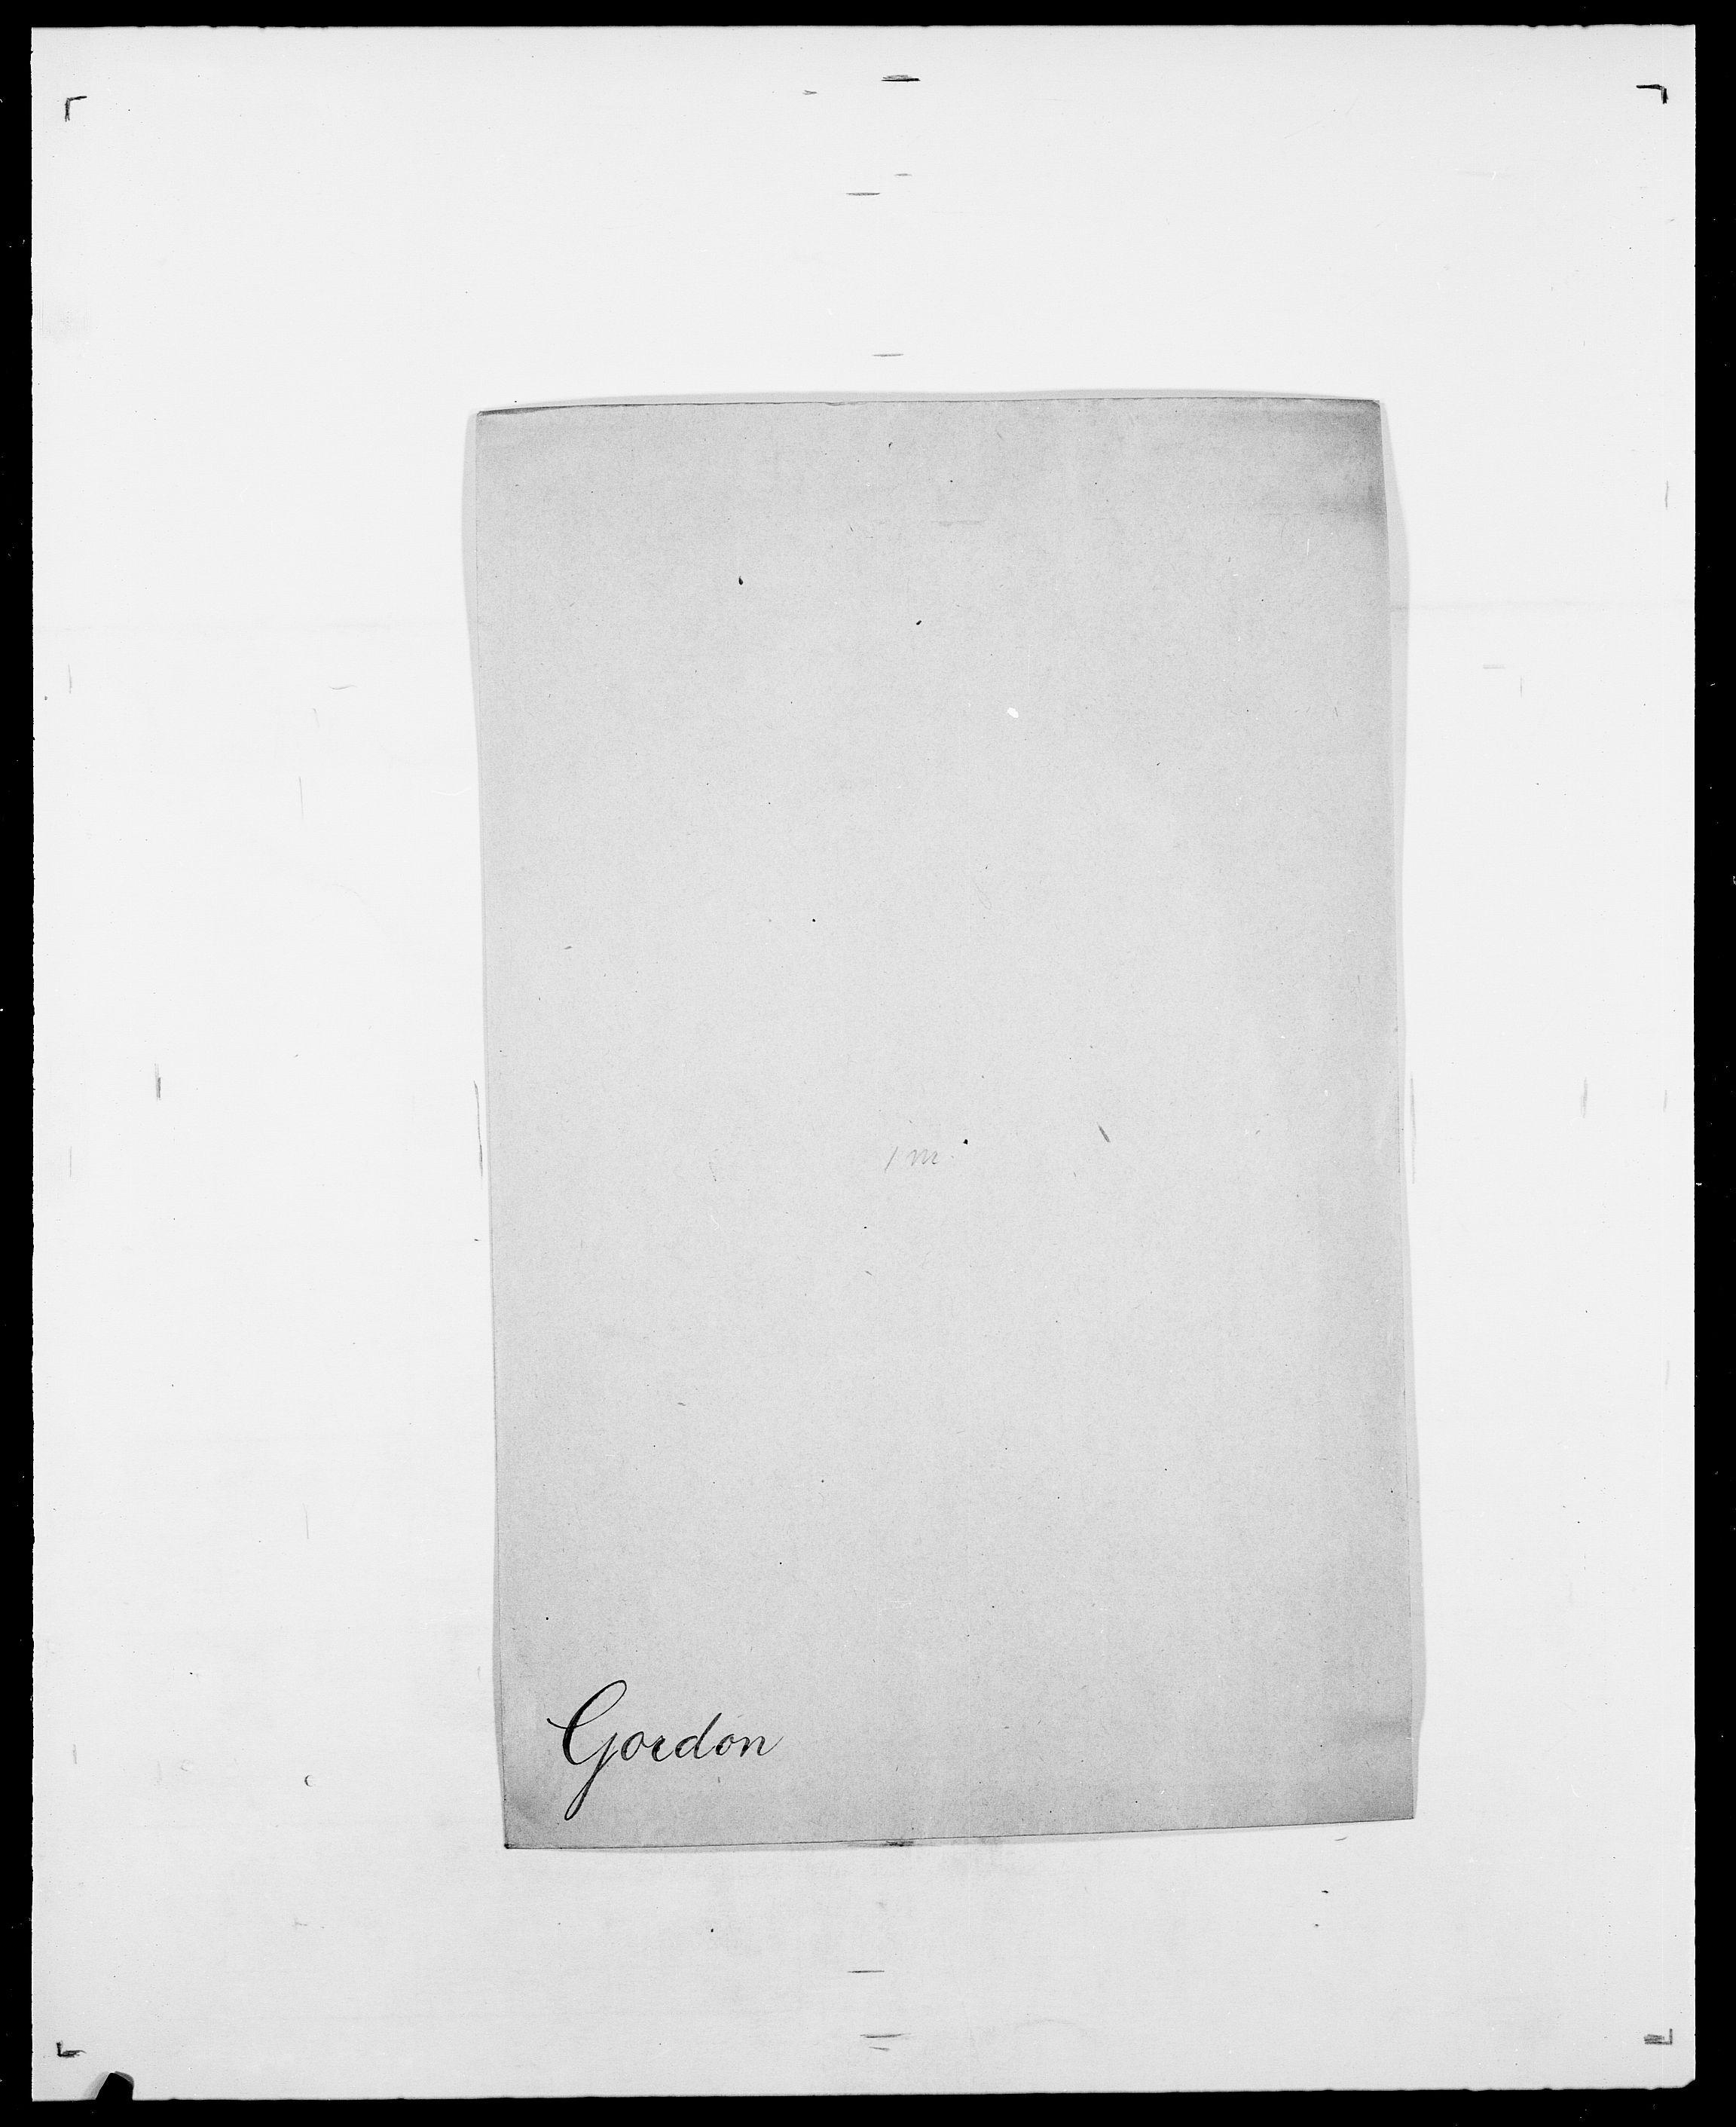 SAO, Delgobe, Charles Antoine - samling, D/Da/L0014: Giebdhausen - Grip, s. 386